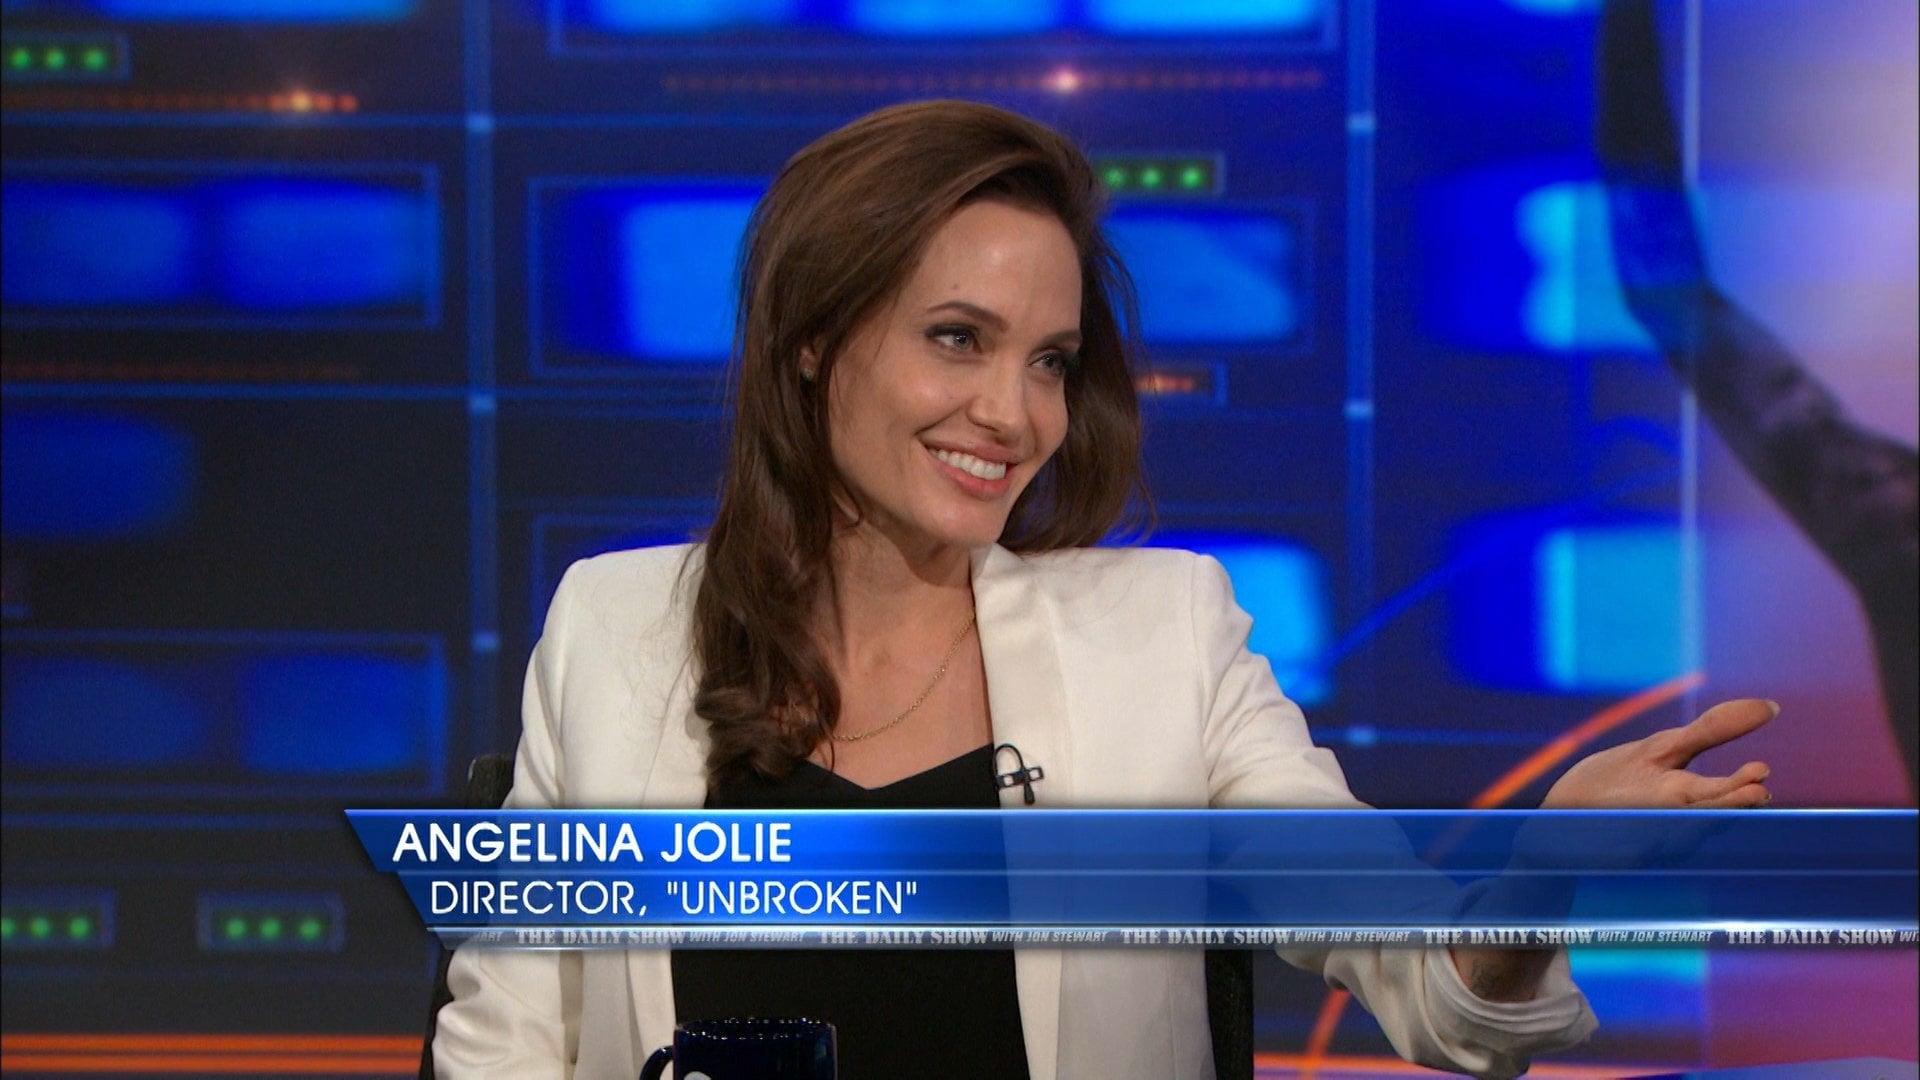 The Daily Show with Trevor Noah Season 20 :Episode 32  Angelina Jolie